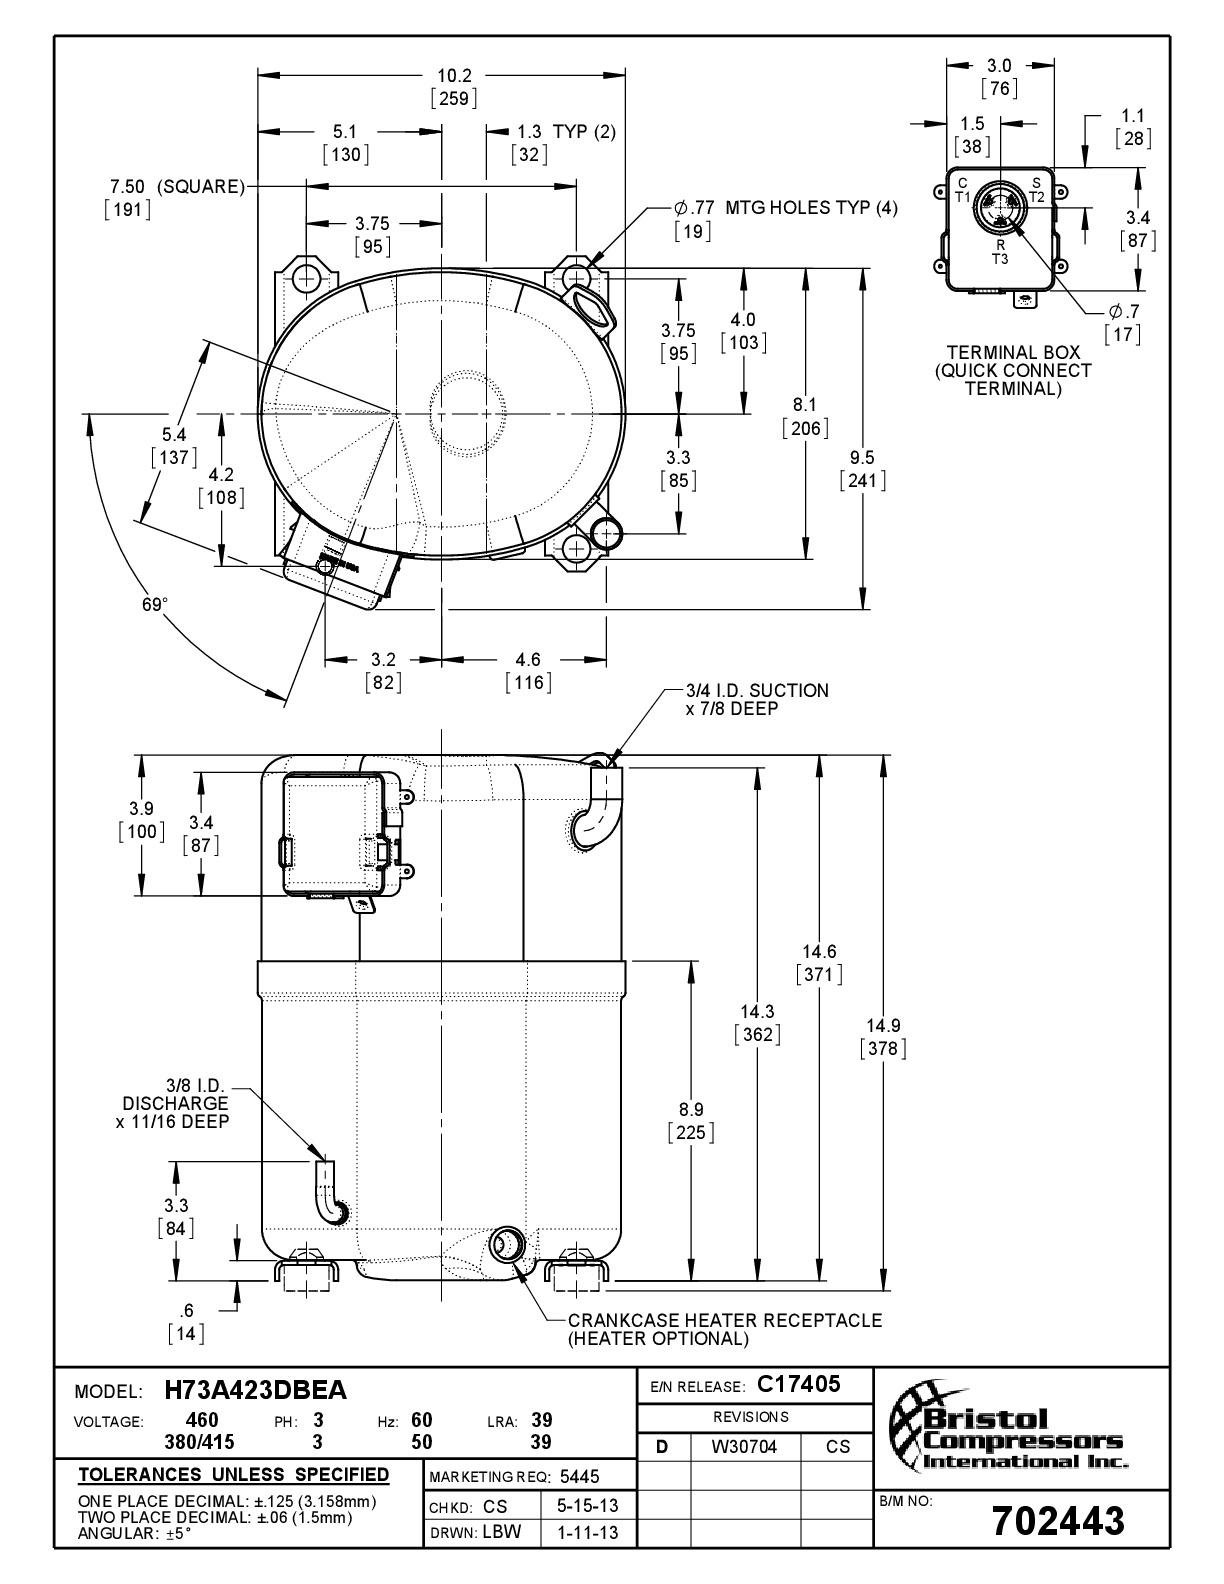 Габаритный чертеж компрессора Bristol H73A423DBEA